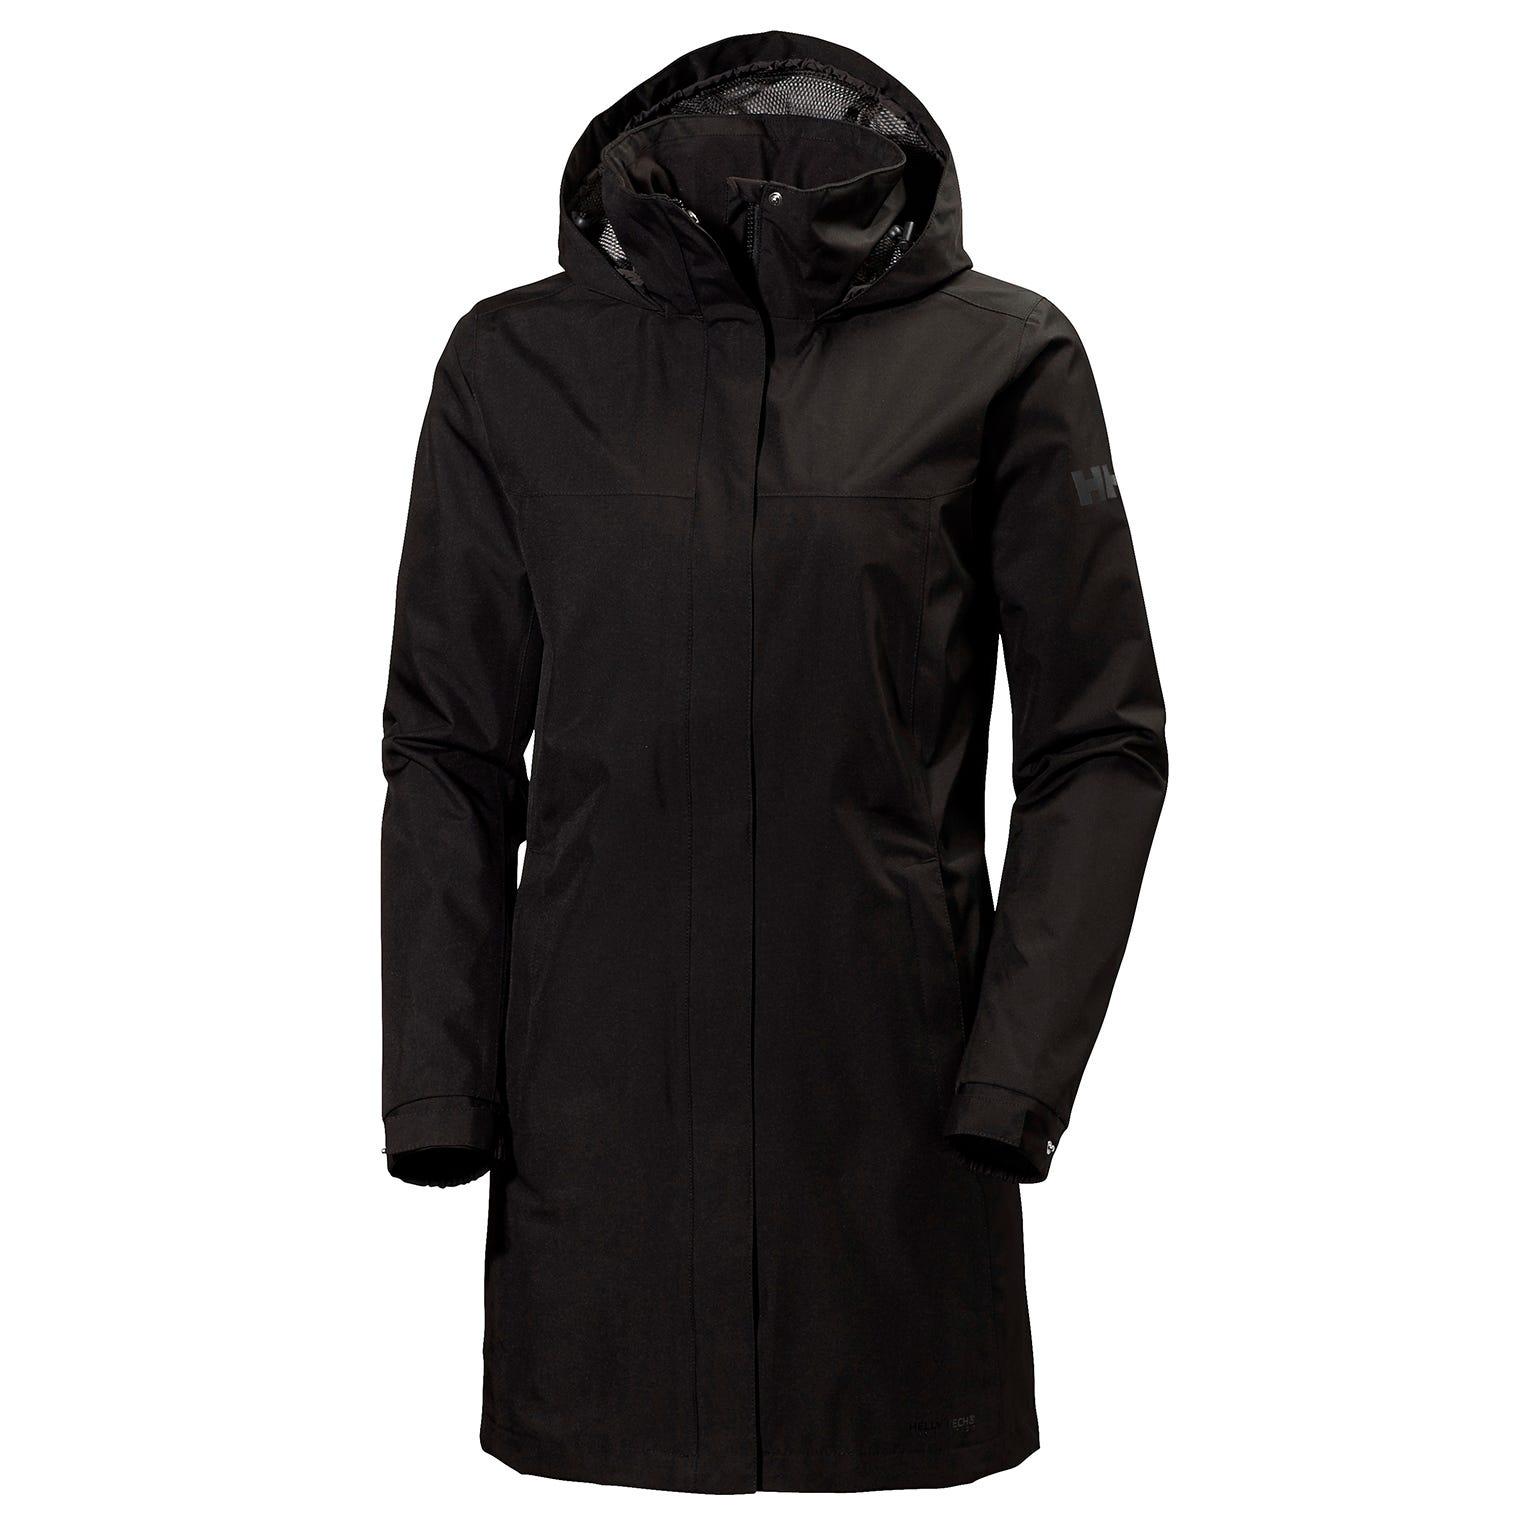 Helly Hansen Women's Aden Long Rain Coat Black XXXXXL